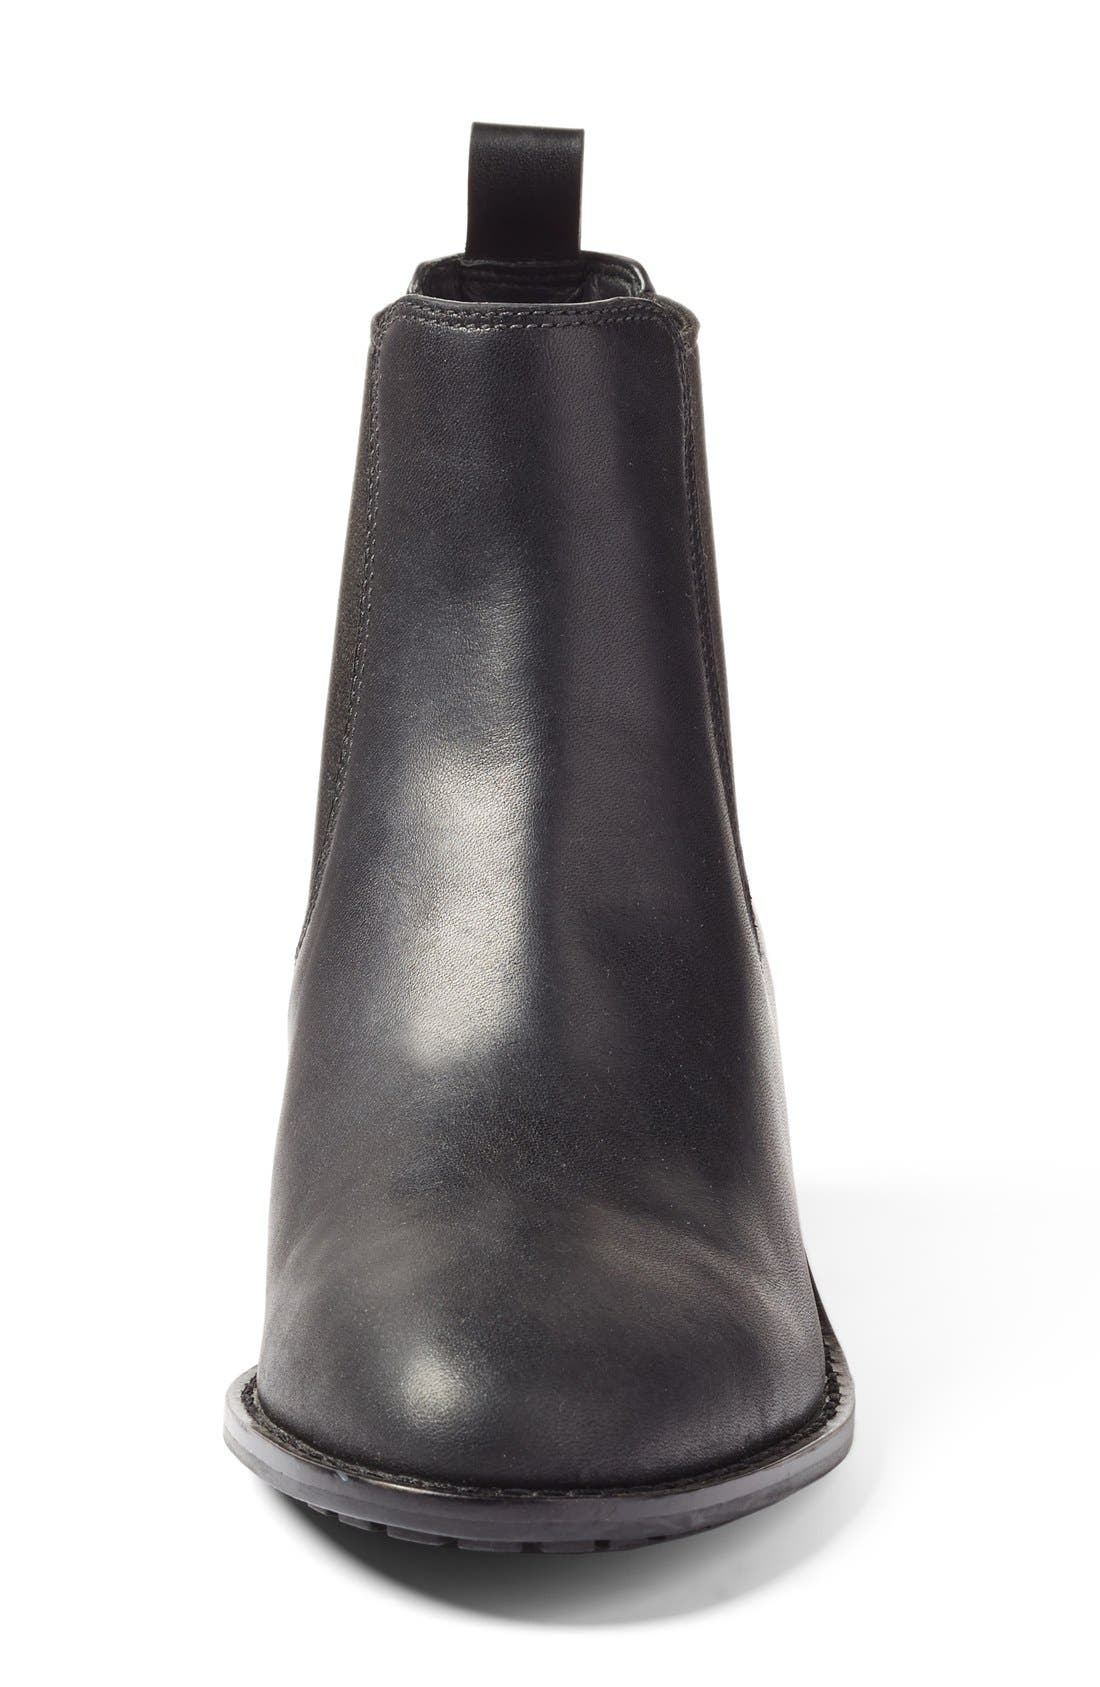 COLE HAAN, Newburg Waterproof Chelsea Boot, Alternate thumbnail 3, color, BLACK LEATHER